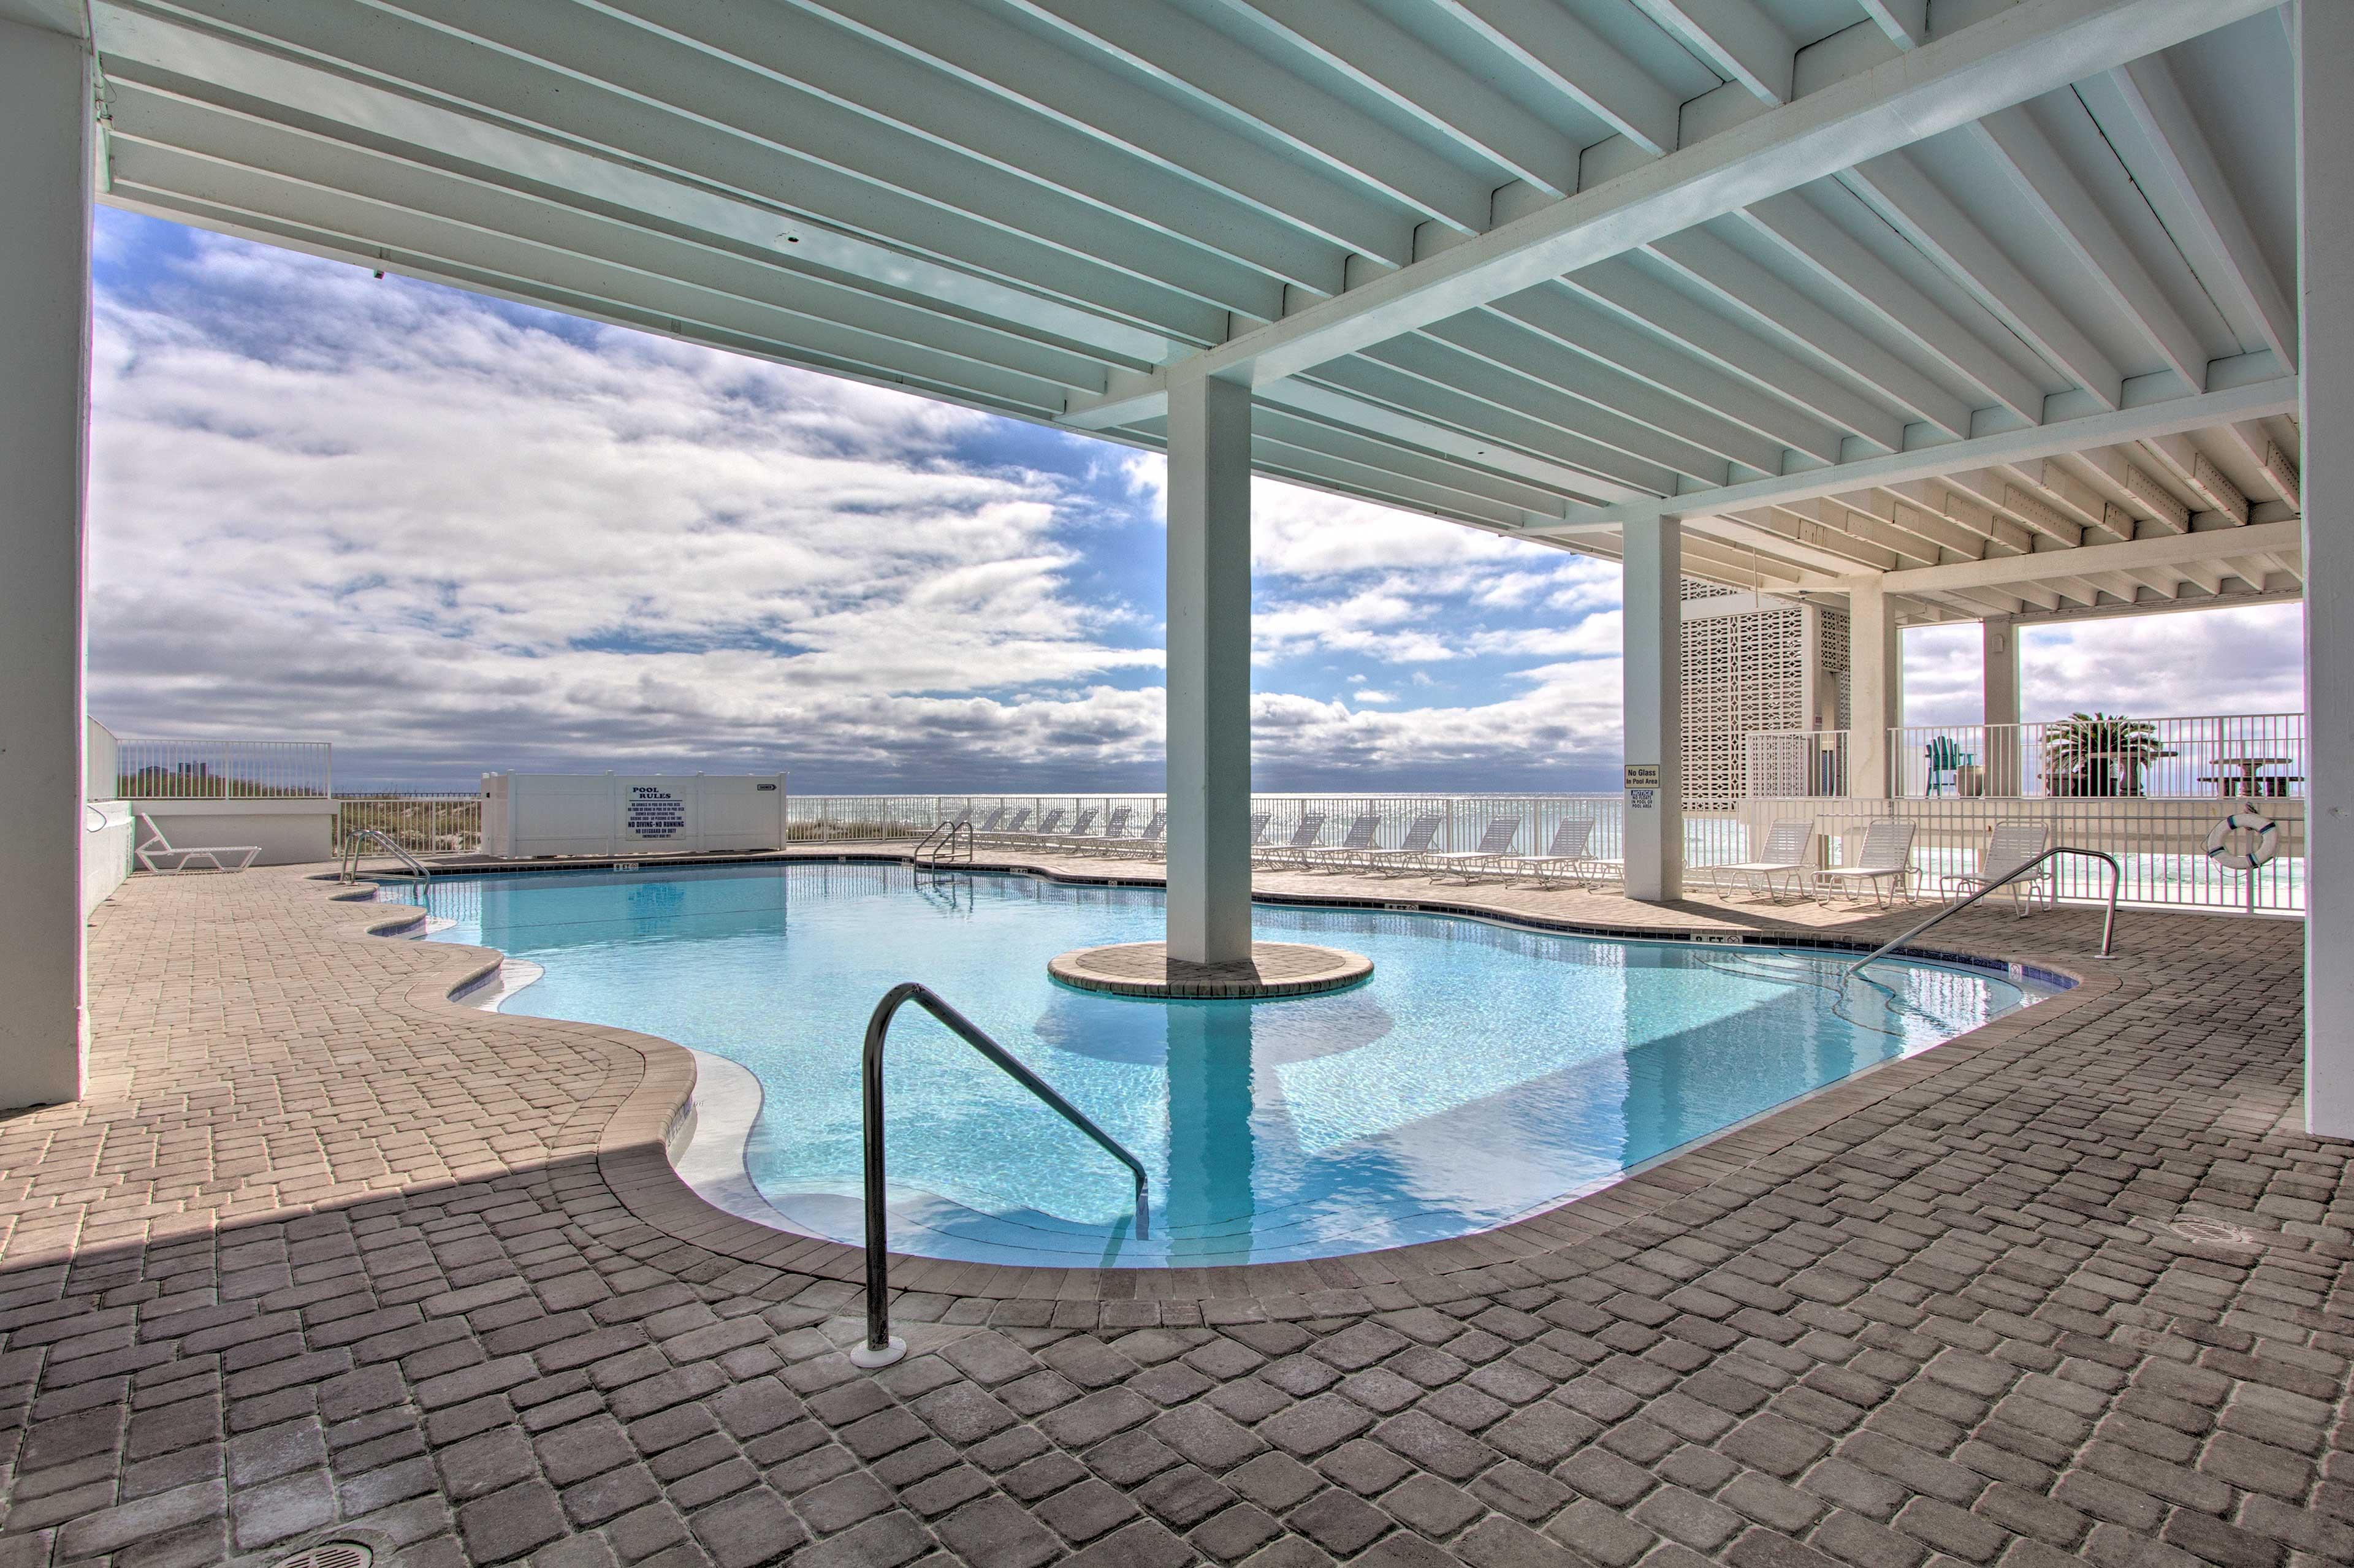 Swim a few laps in the community pool.